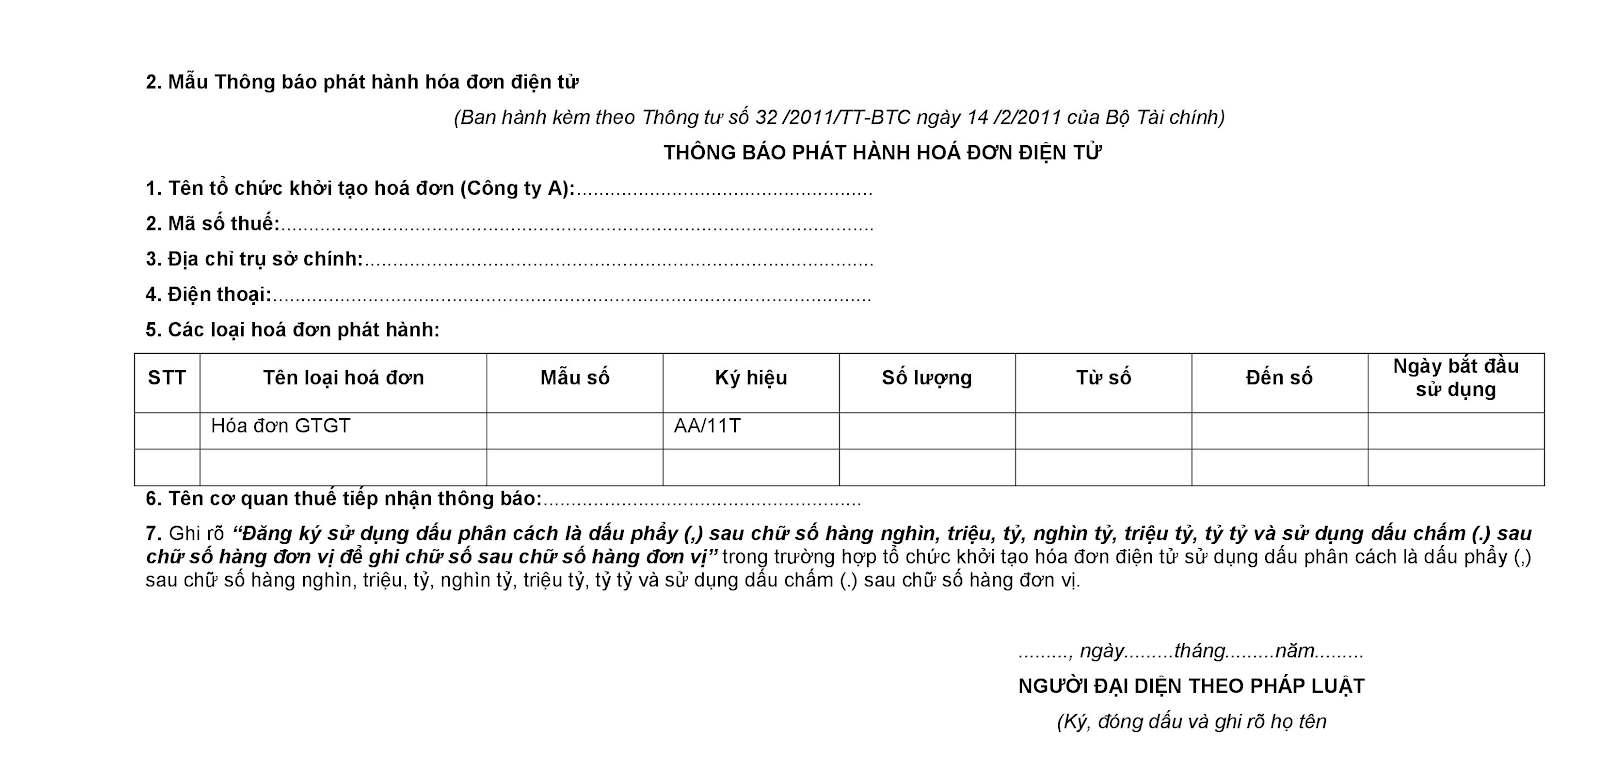 mau thong bao phat hanh hoa don dien tu